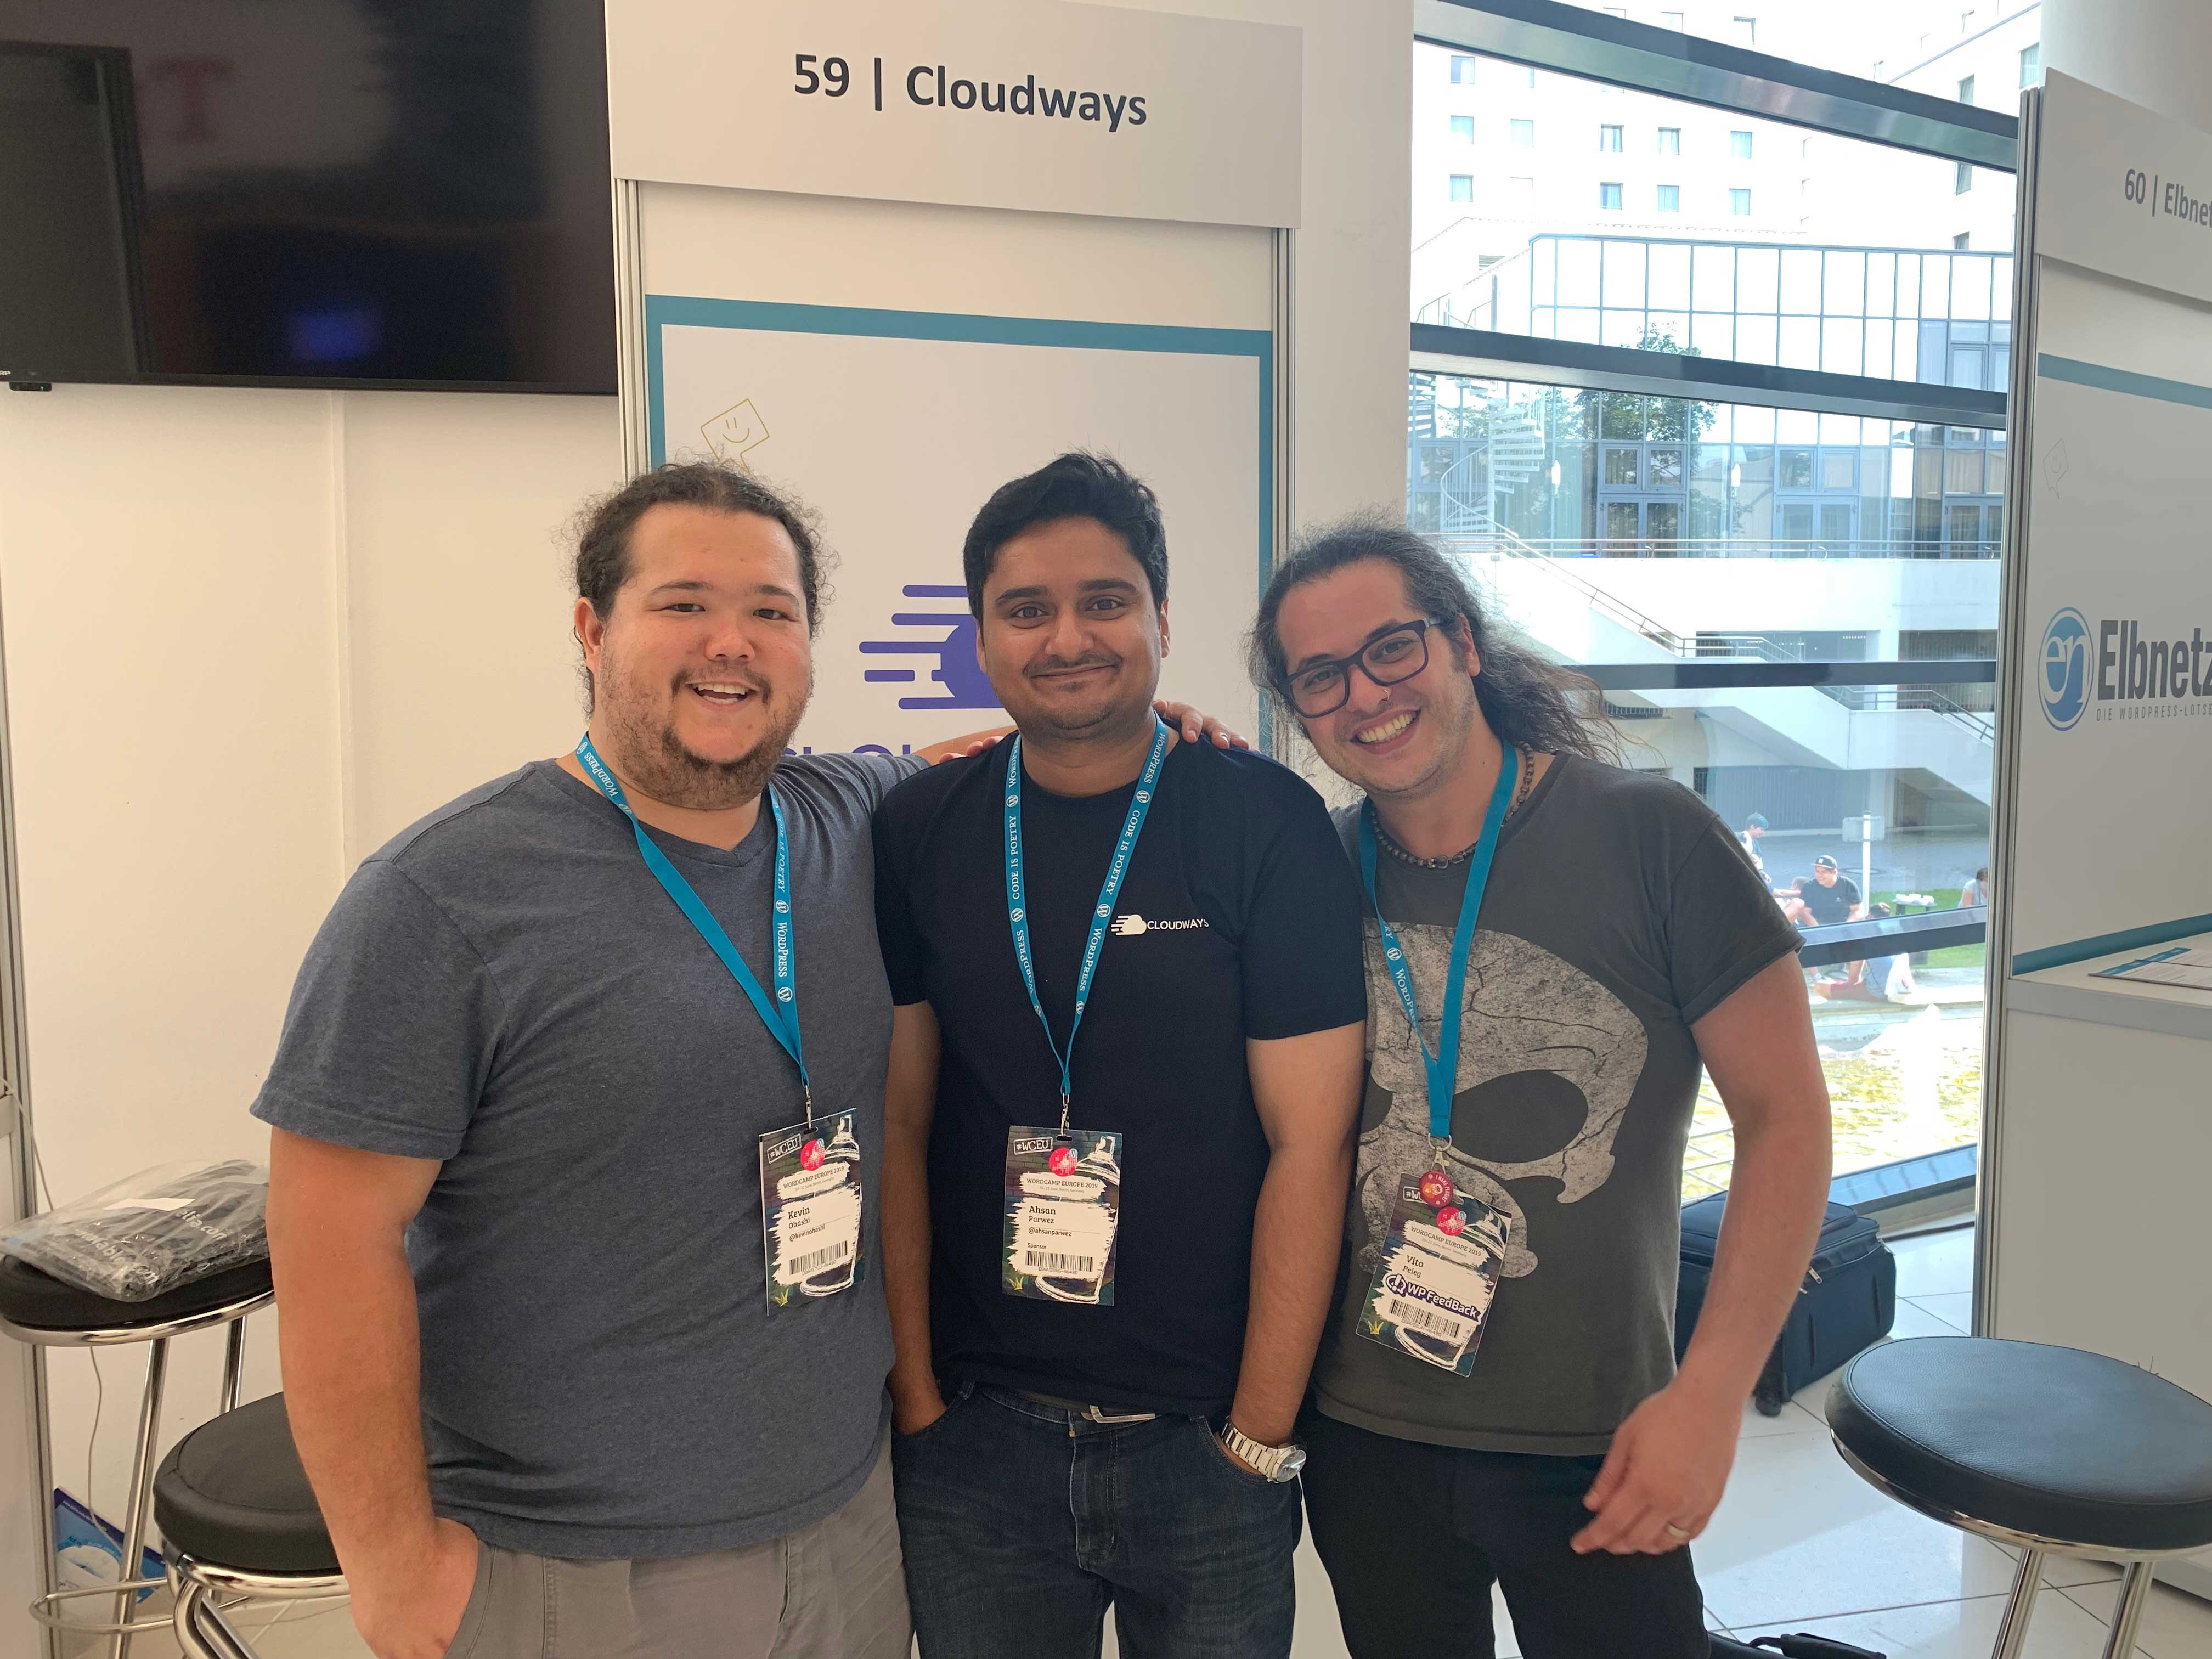 Vito Meeting Cloudways Team